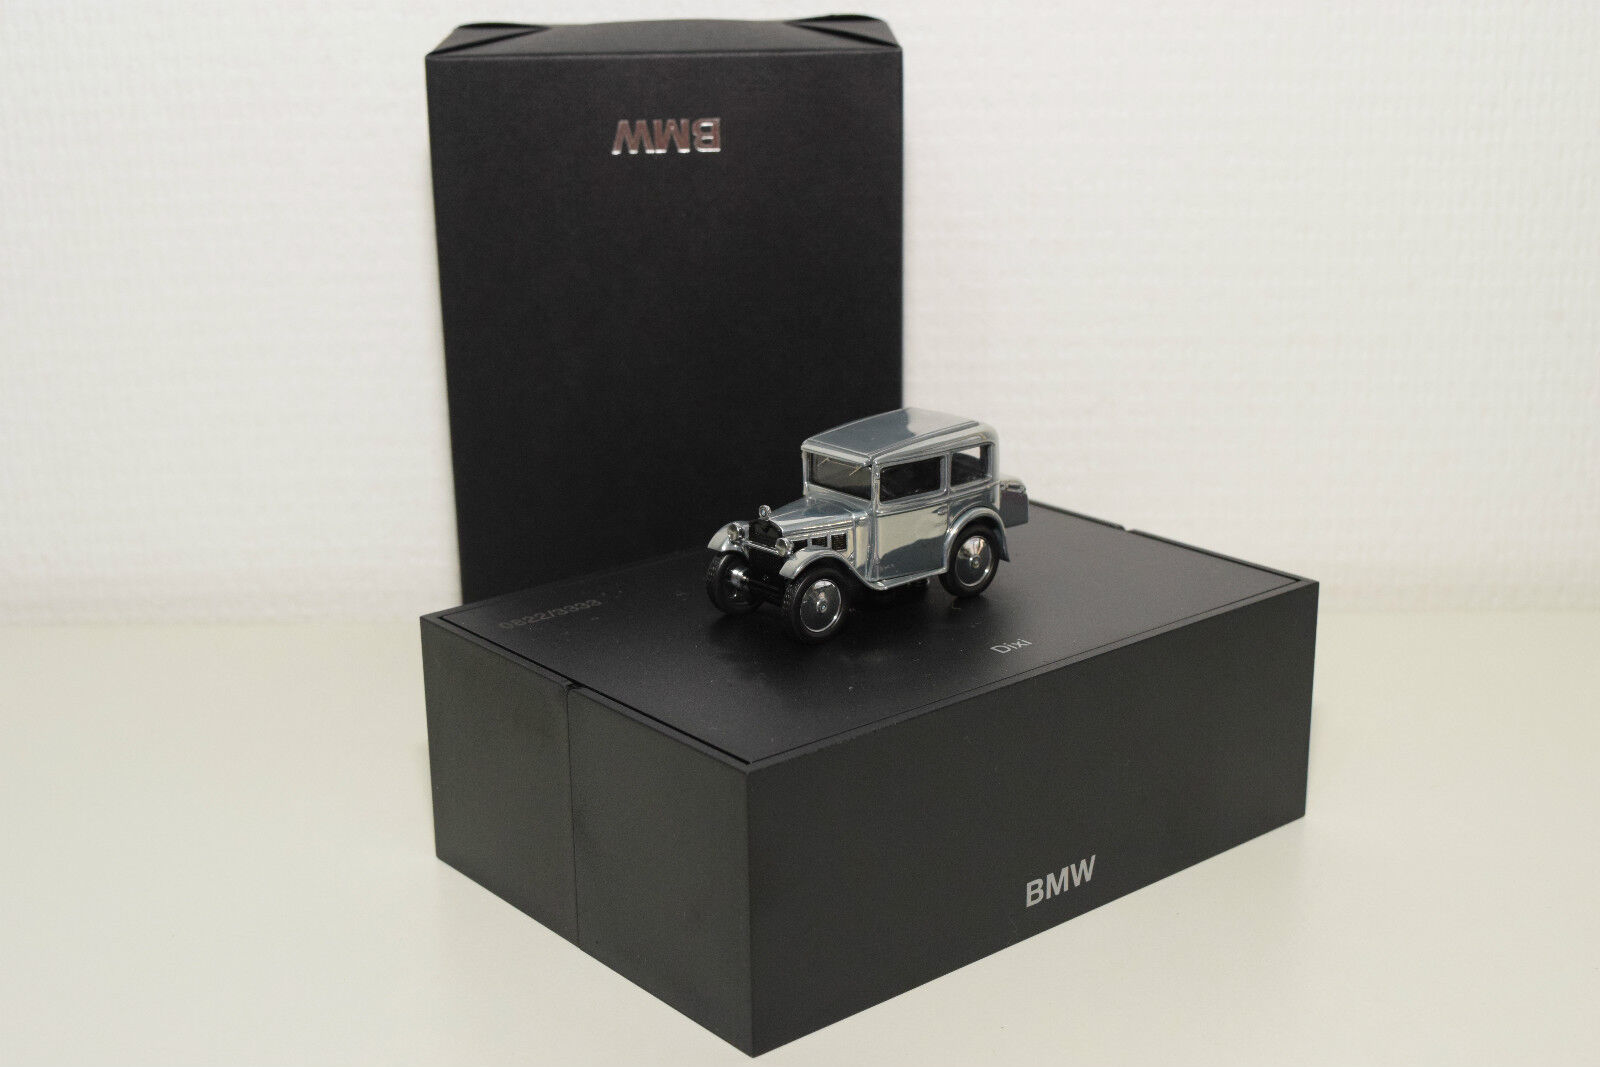 SCHUCO BMW DIXI CHROME PLATED MINT DEALER BOXED RARE SELTEN 0822 3333